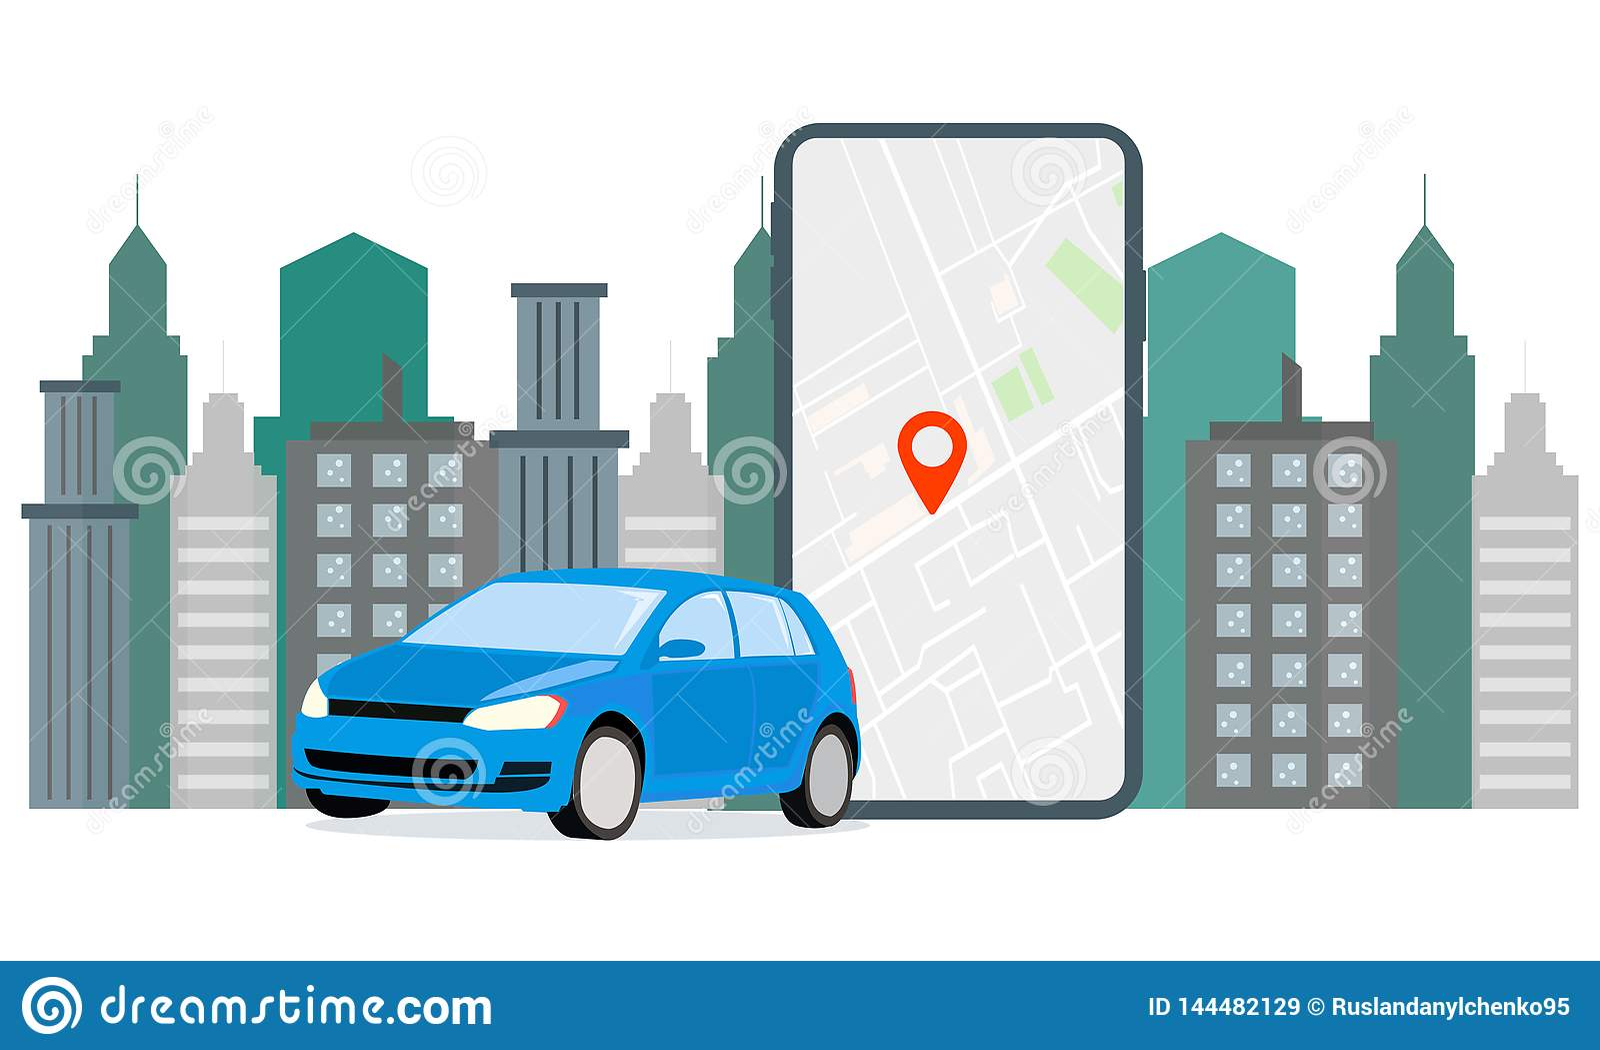 Banner Illustration Navigation Car Rental The Screen Displays Gps Data Car Parking Use Car Hire For Mobile Services Stock Vector Illustration Of Holding Data 144482129